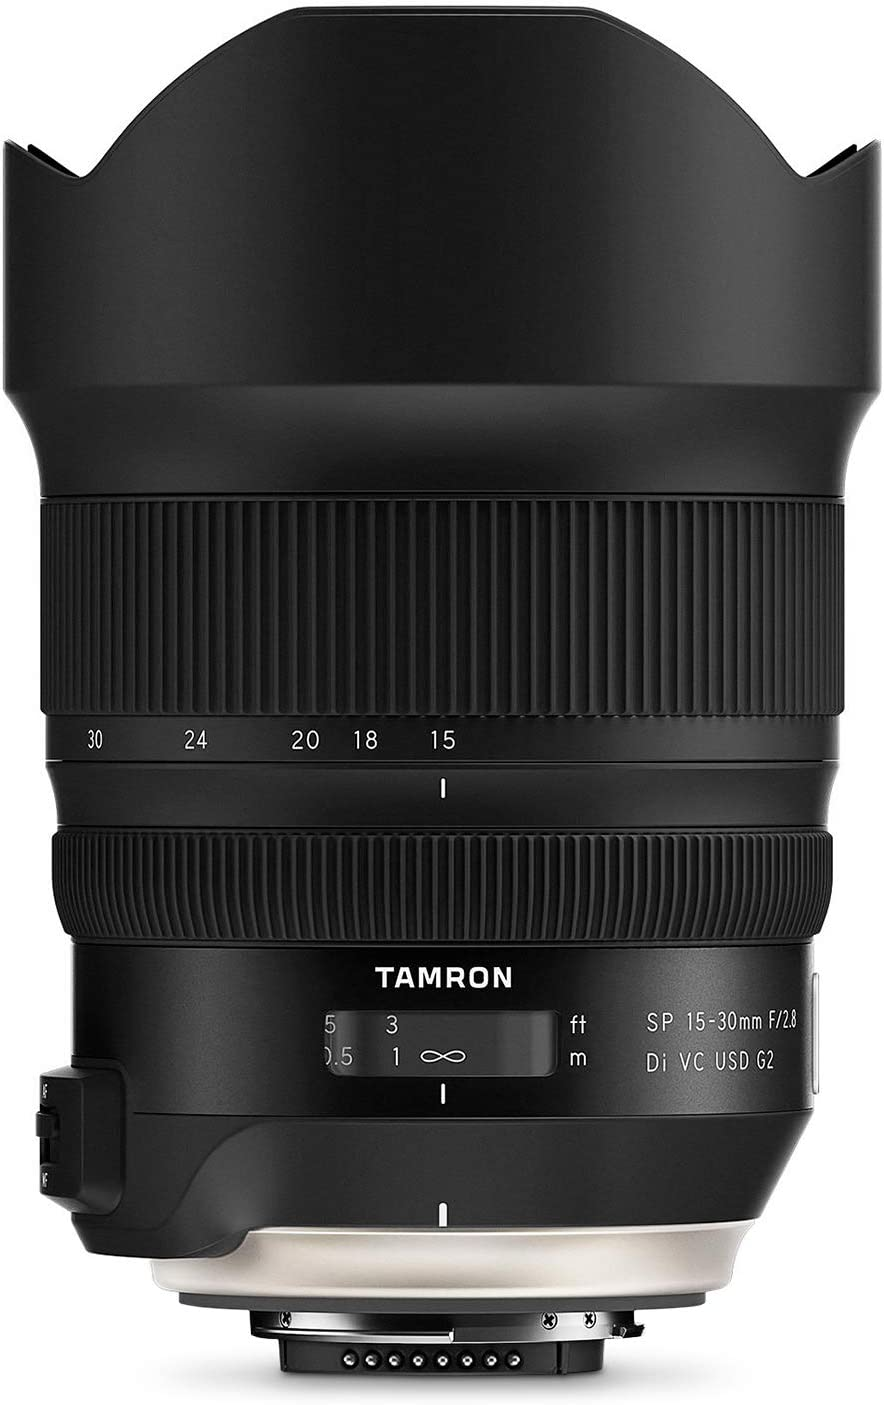 Tamron Sp 15 30mm F 2 8 Di Vc Wg G2 Lens For Nikon F Camera Photo